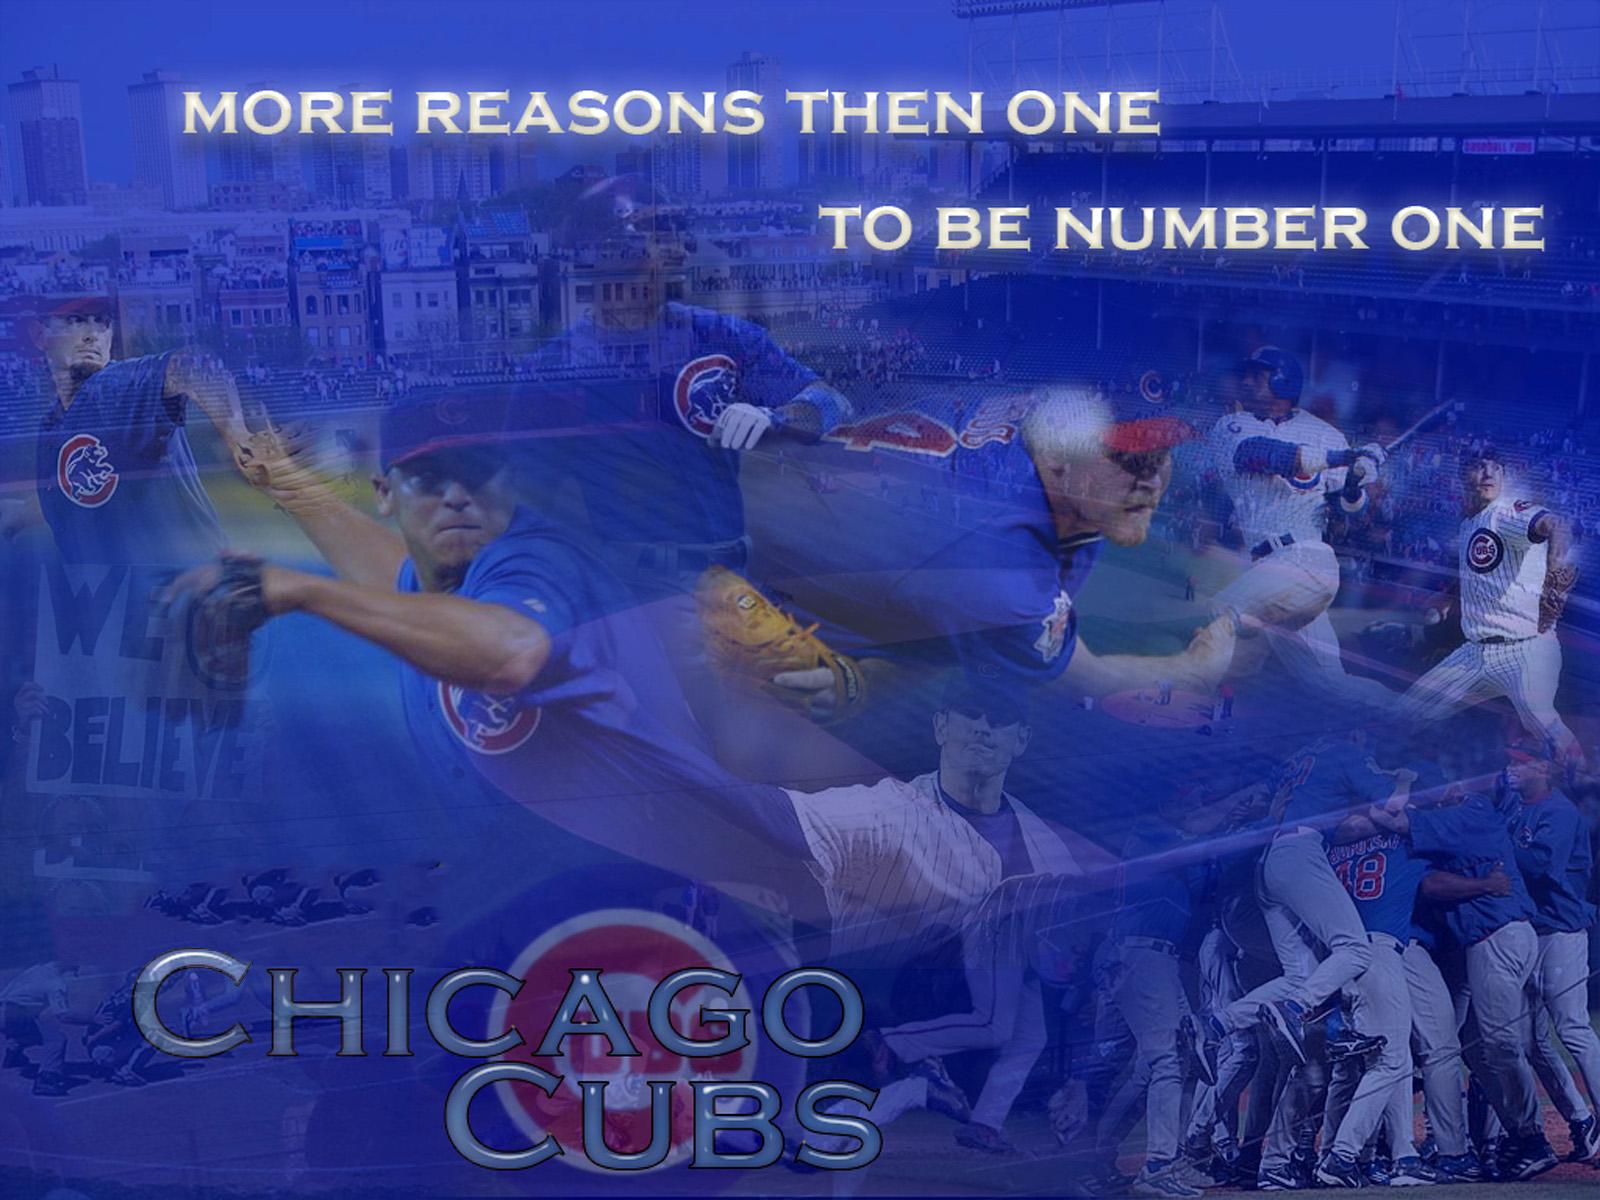 CHICAGO CUBS mlb baseball 20 wallpaper 1600x1200 232526 1600x1200